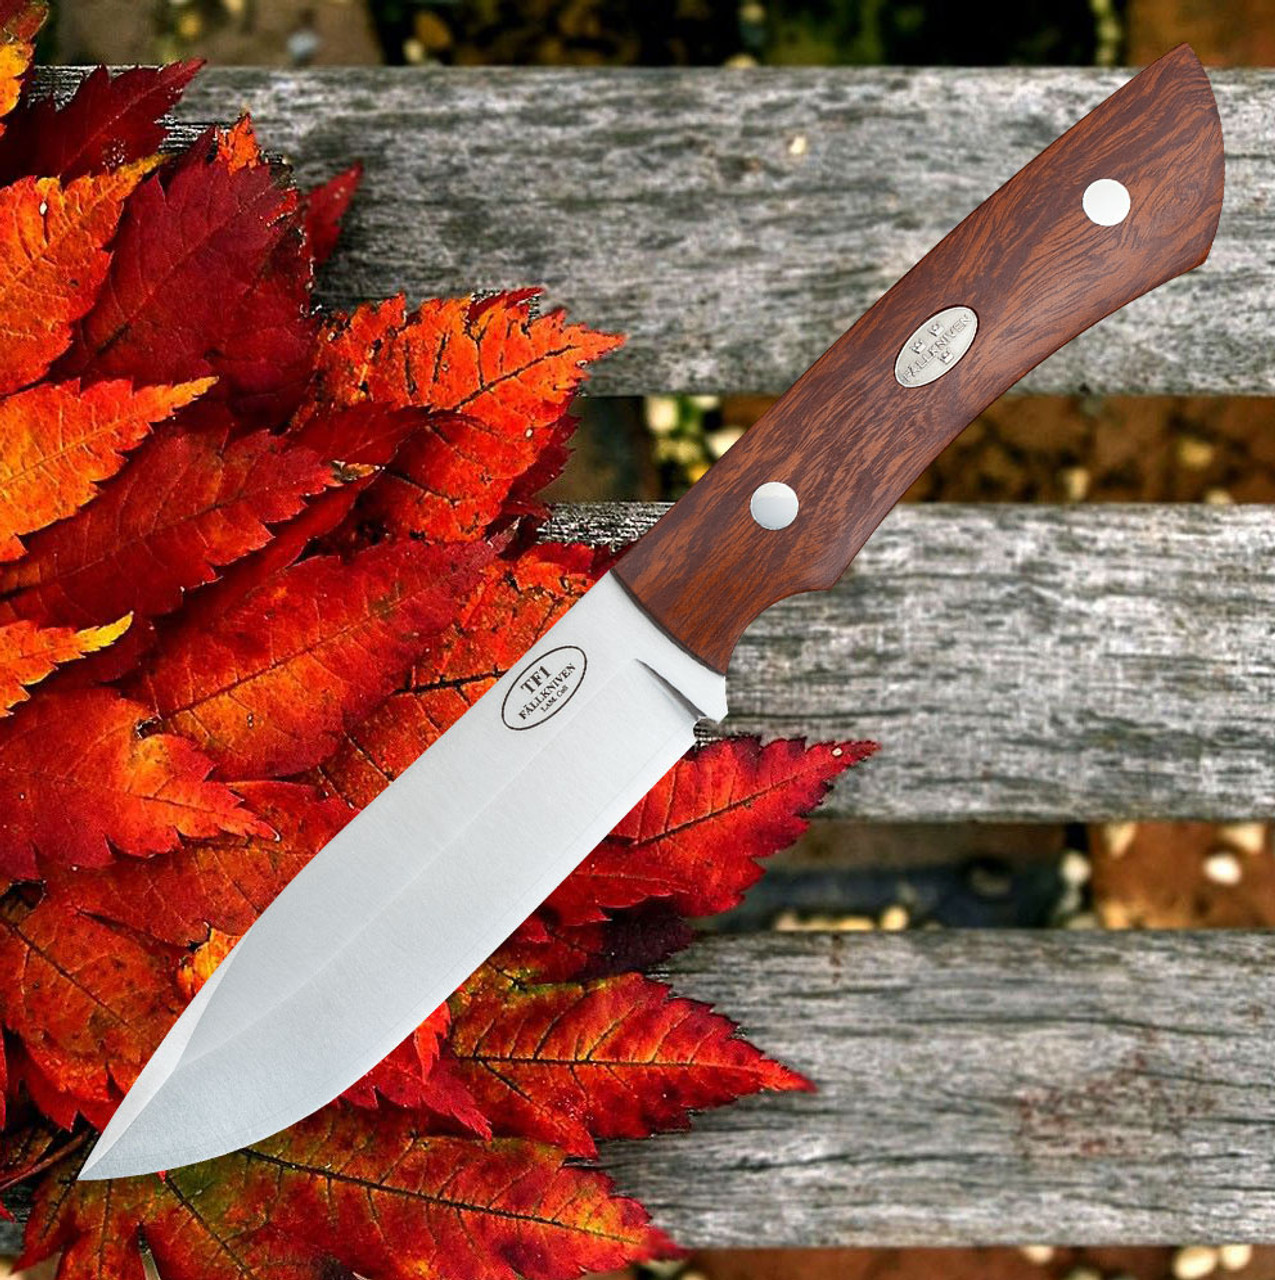 "Fallkniven Taiga Forester 1, 4.75"" Lam. CoS Plain Blade, Desert Ironwood Handle w/ Zytel Sheath"